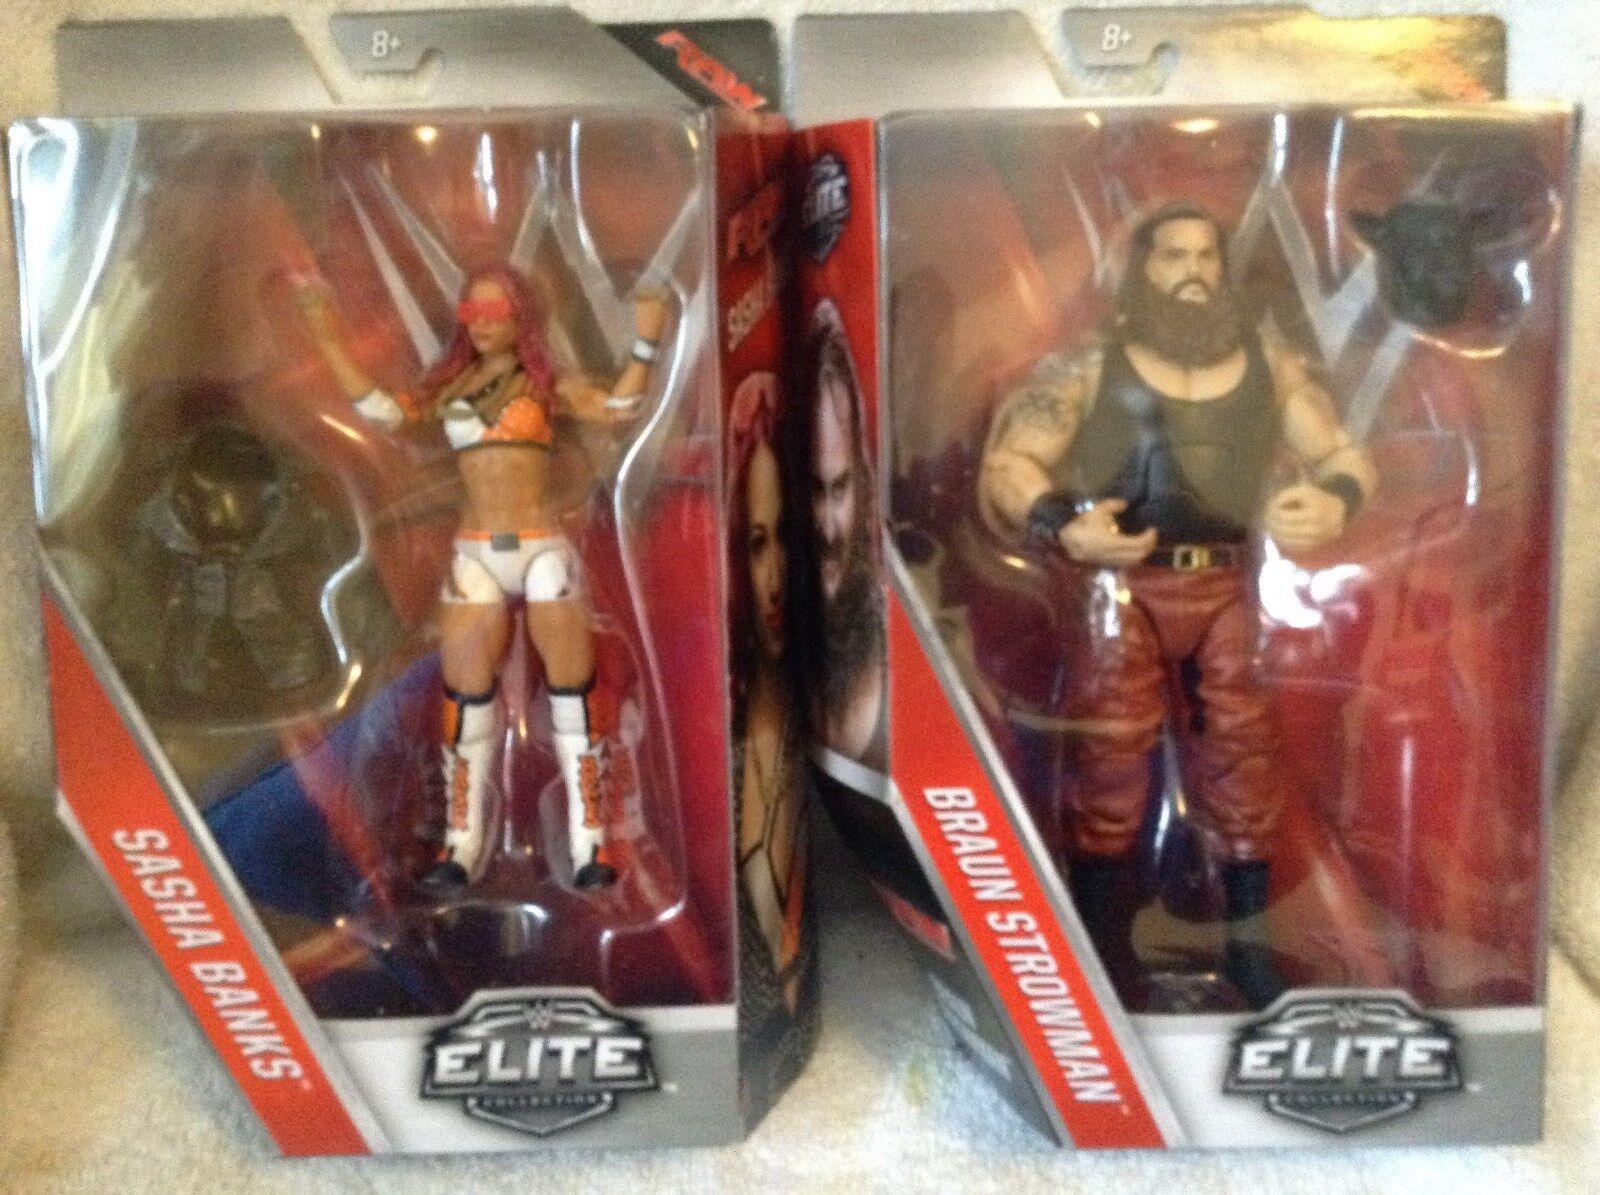 WWE Elite Combo Sasha Banks & Braun Strowman Ser.50  MIB 2017 Brand Nuovo Limited